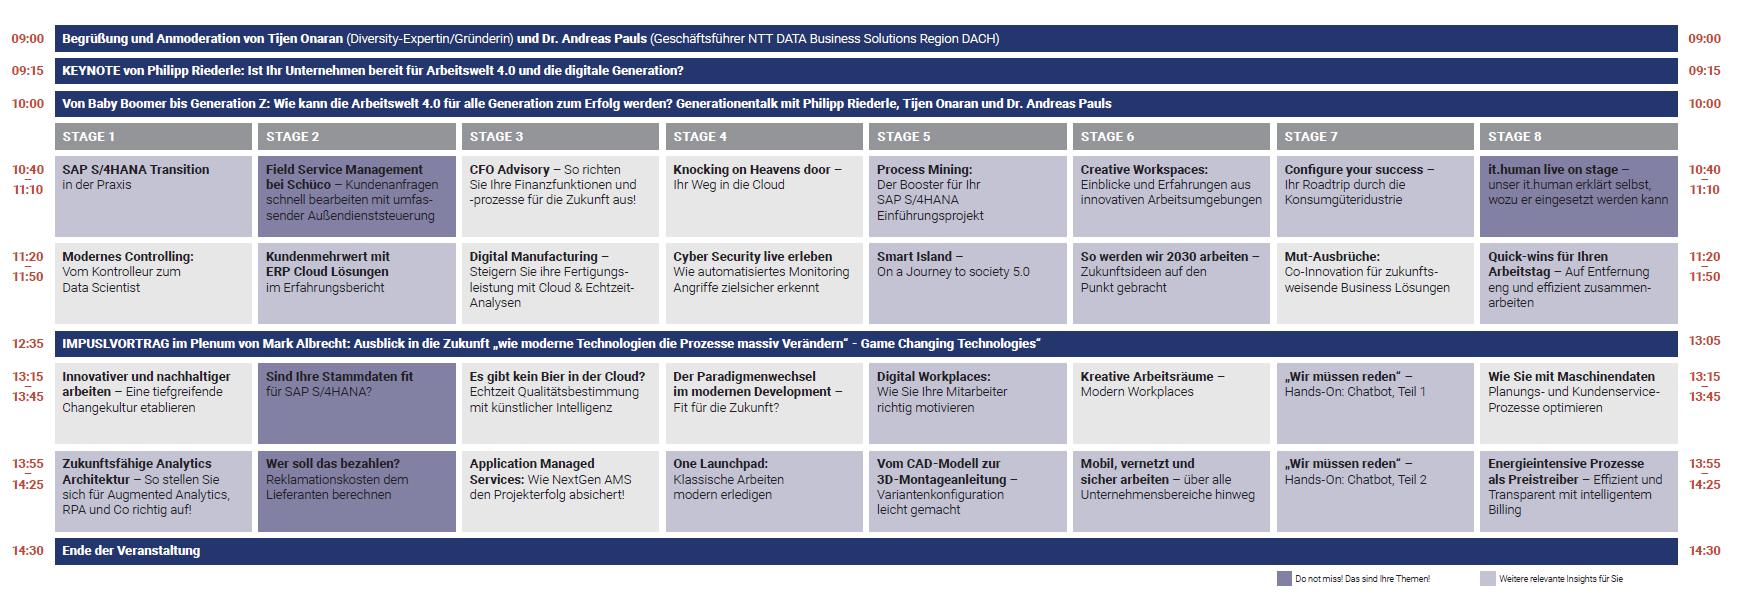 Transformation-NOW-2021-Agenda-Tag-2-Vertrieb_210601